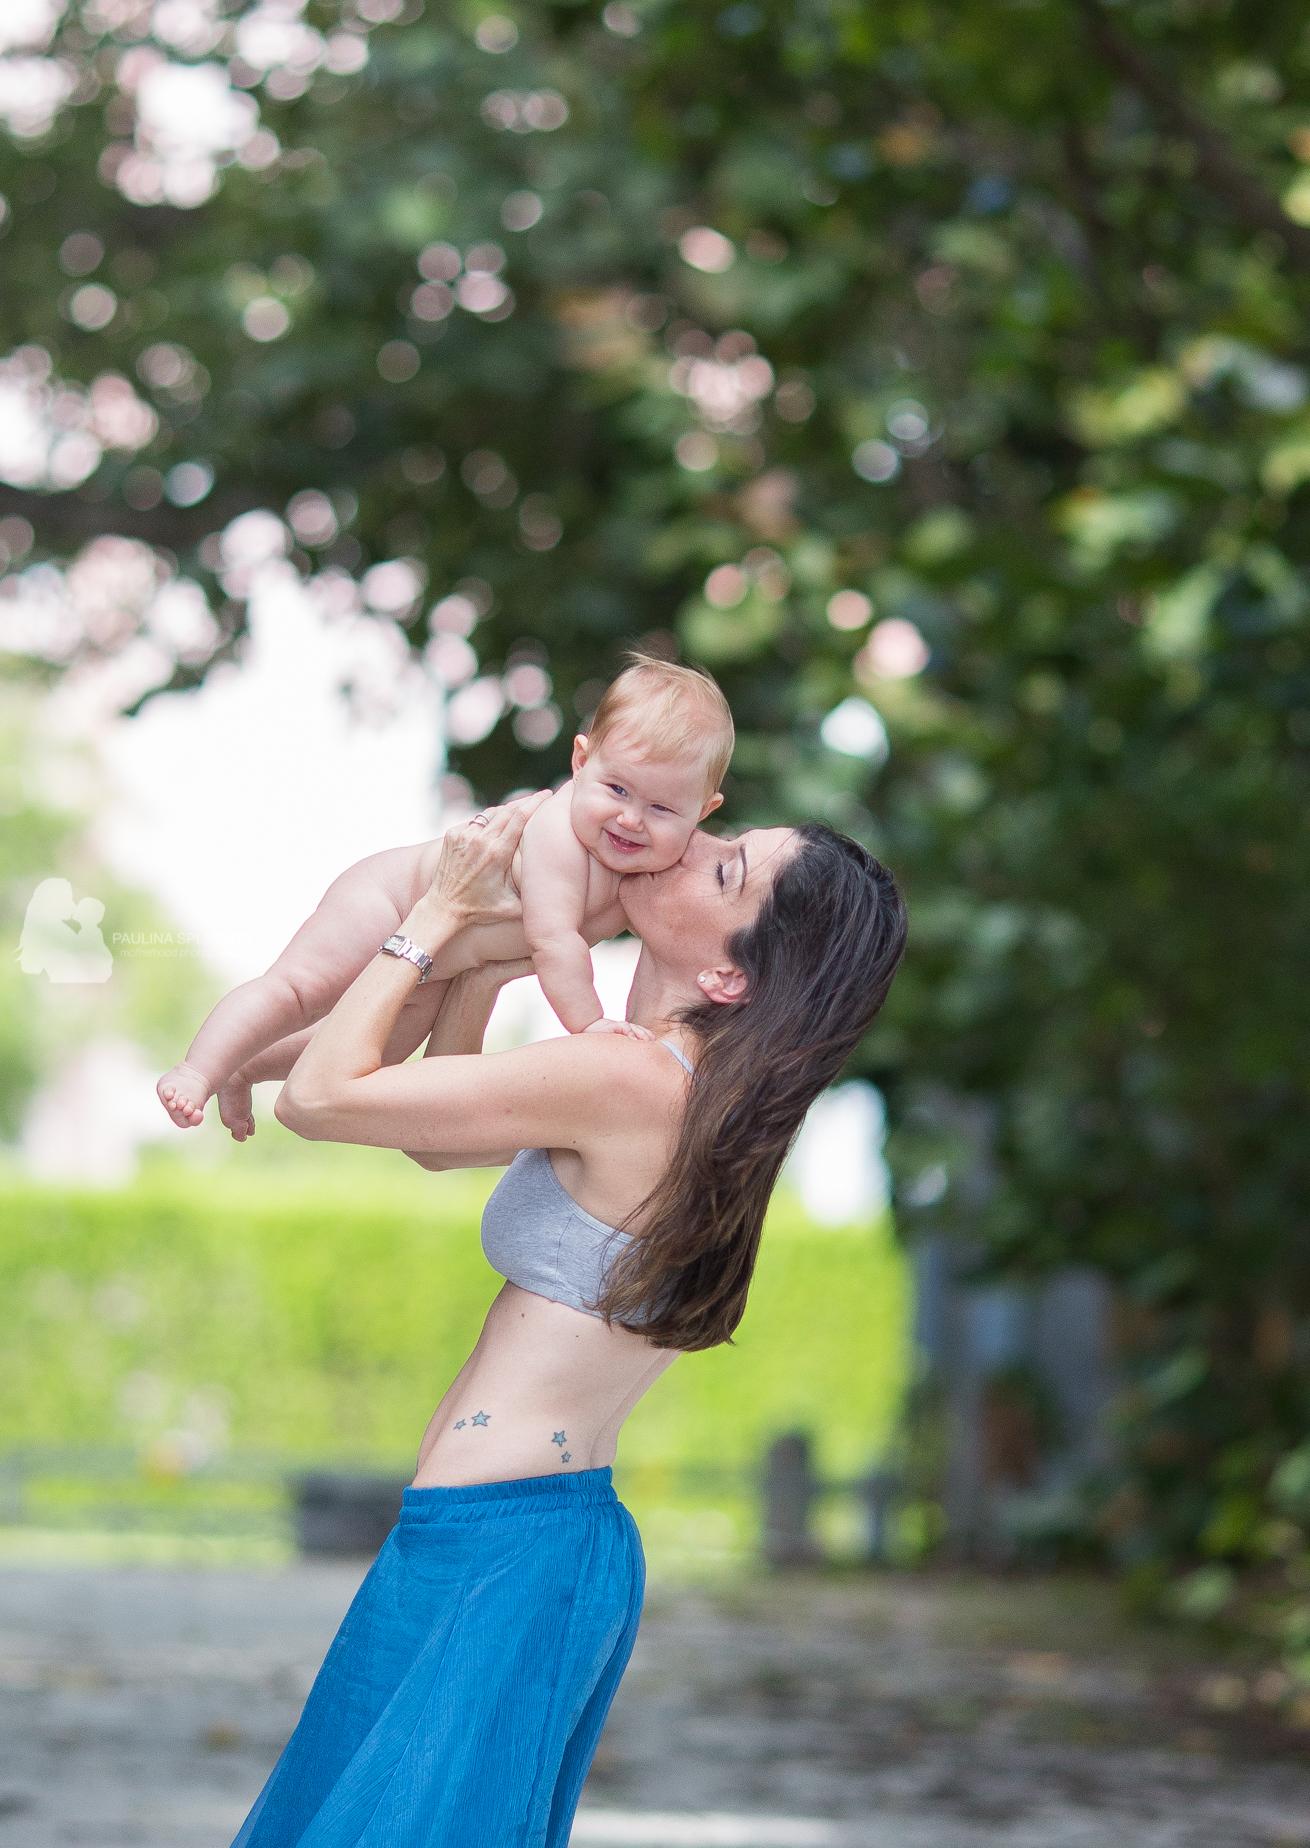 birth-photographer-breastfeeding-family-child-newborn-cake-smash-pregnancy-maternity-7.jpg